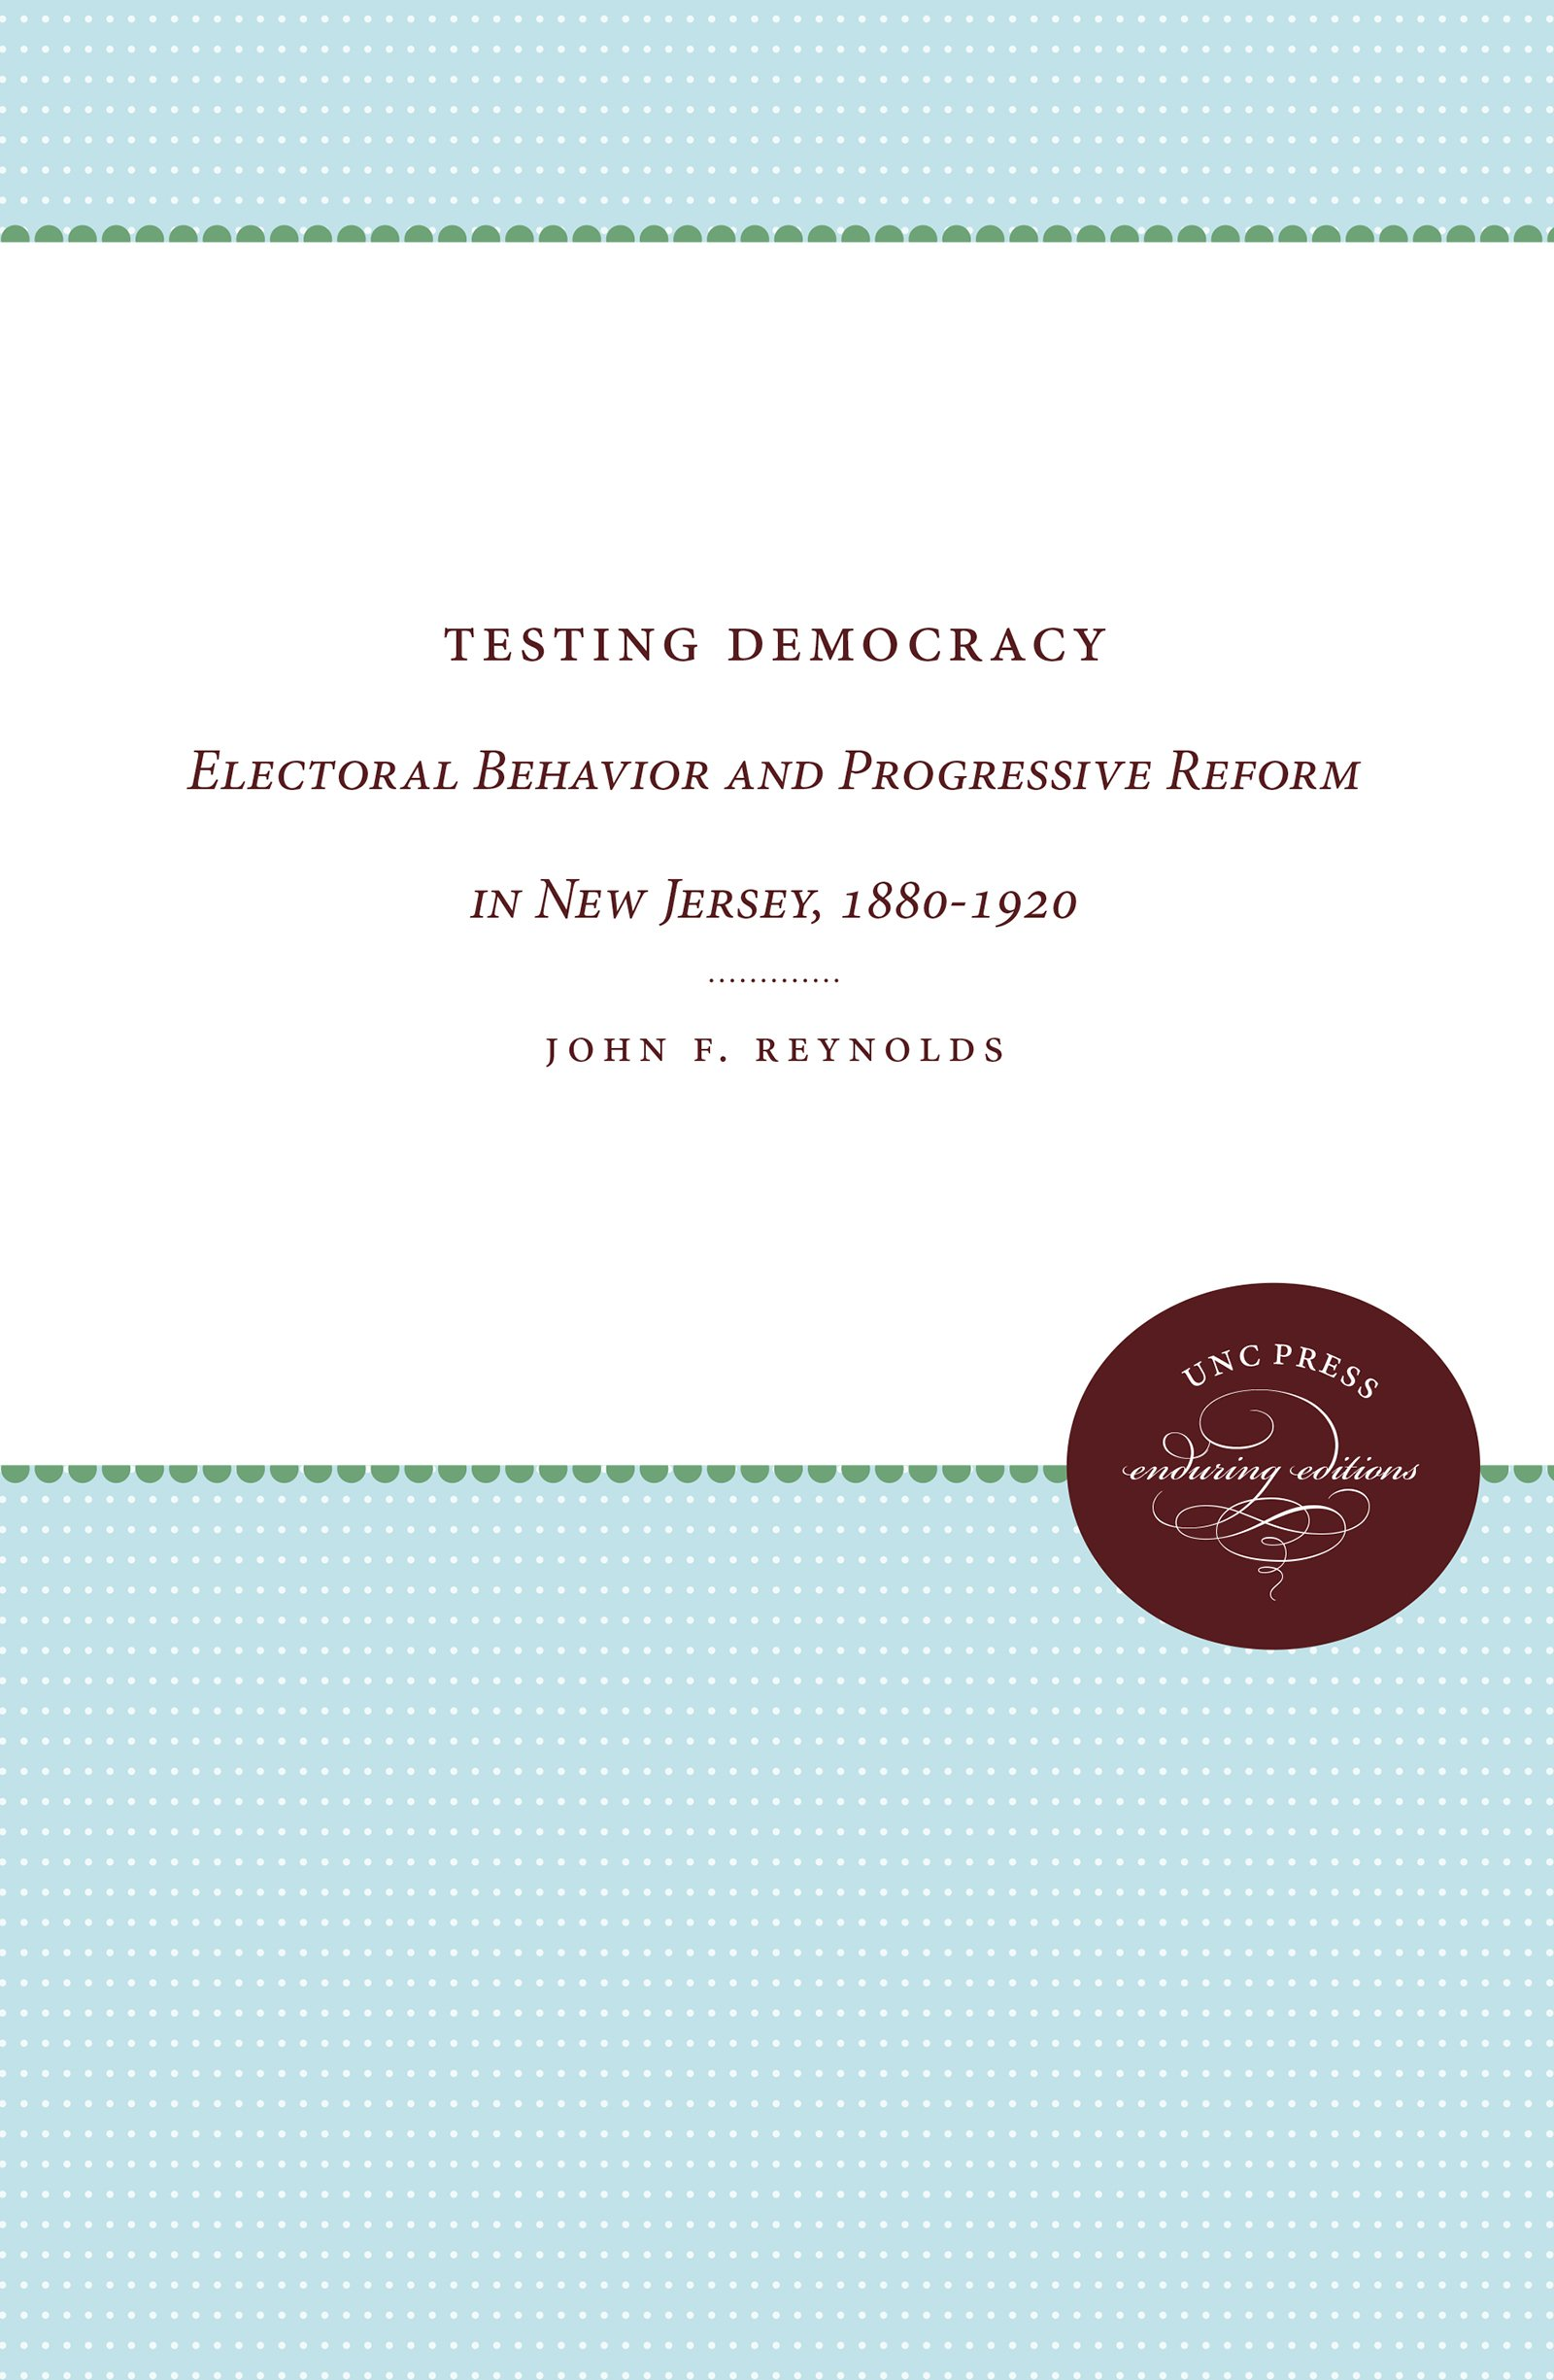 Download Testing Democracy: Electoral Behavior and Progressive Reform in New Jersey, 1880-1920 ebook